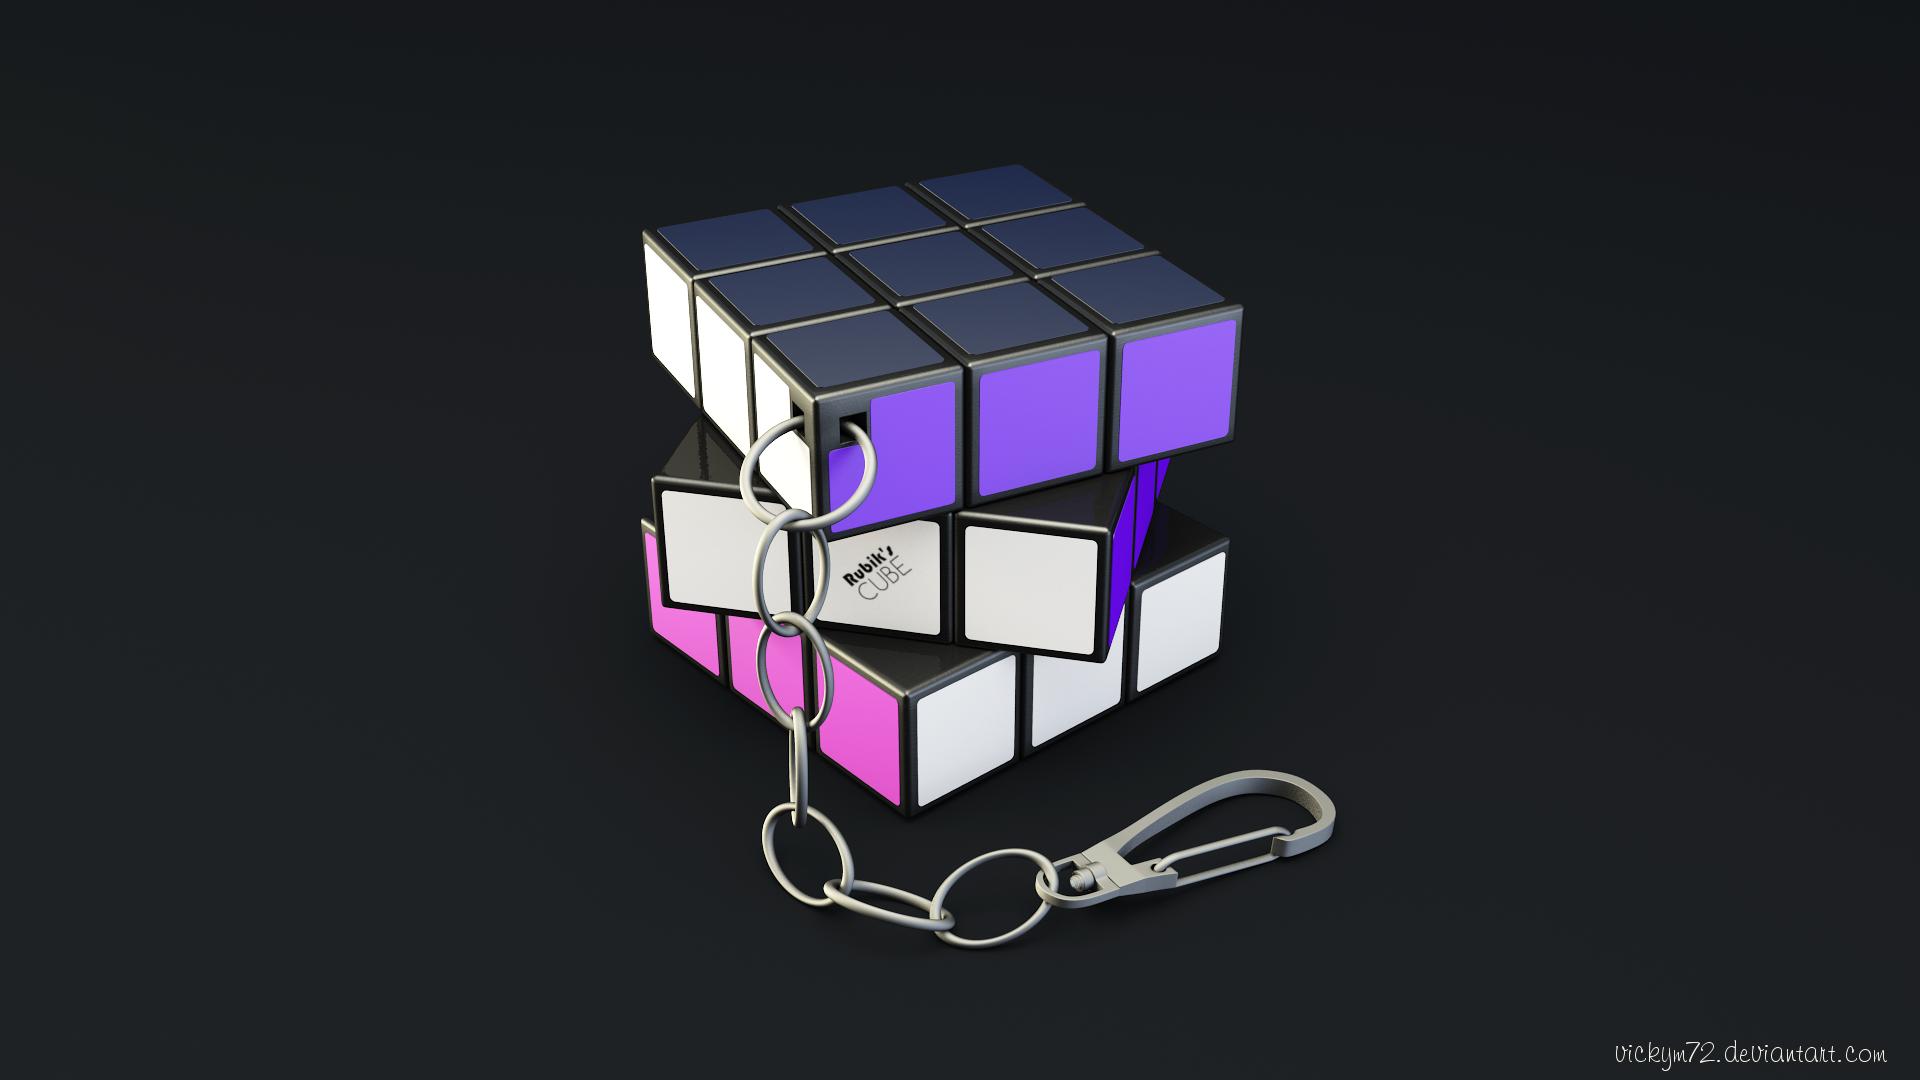 Rubik's Cube Keychain by VickyM72